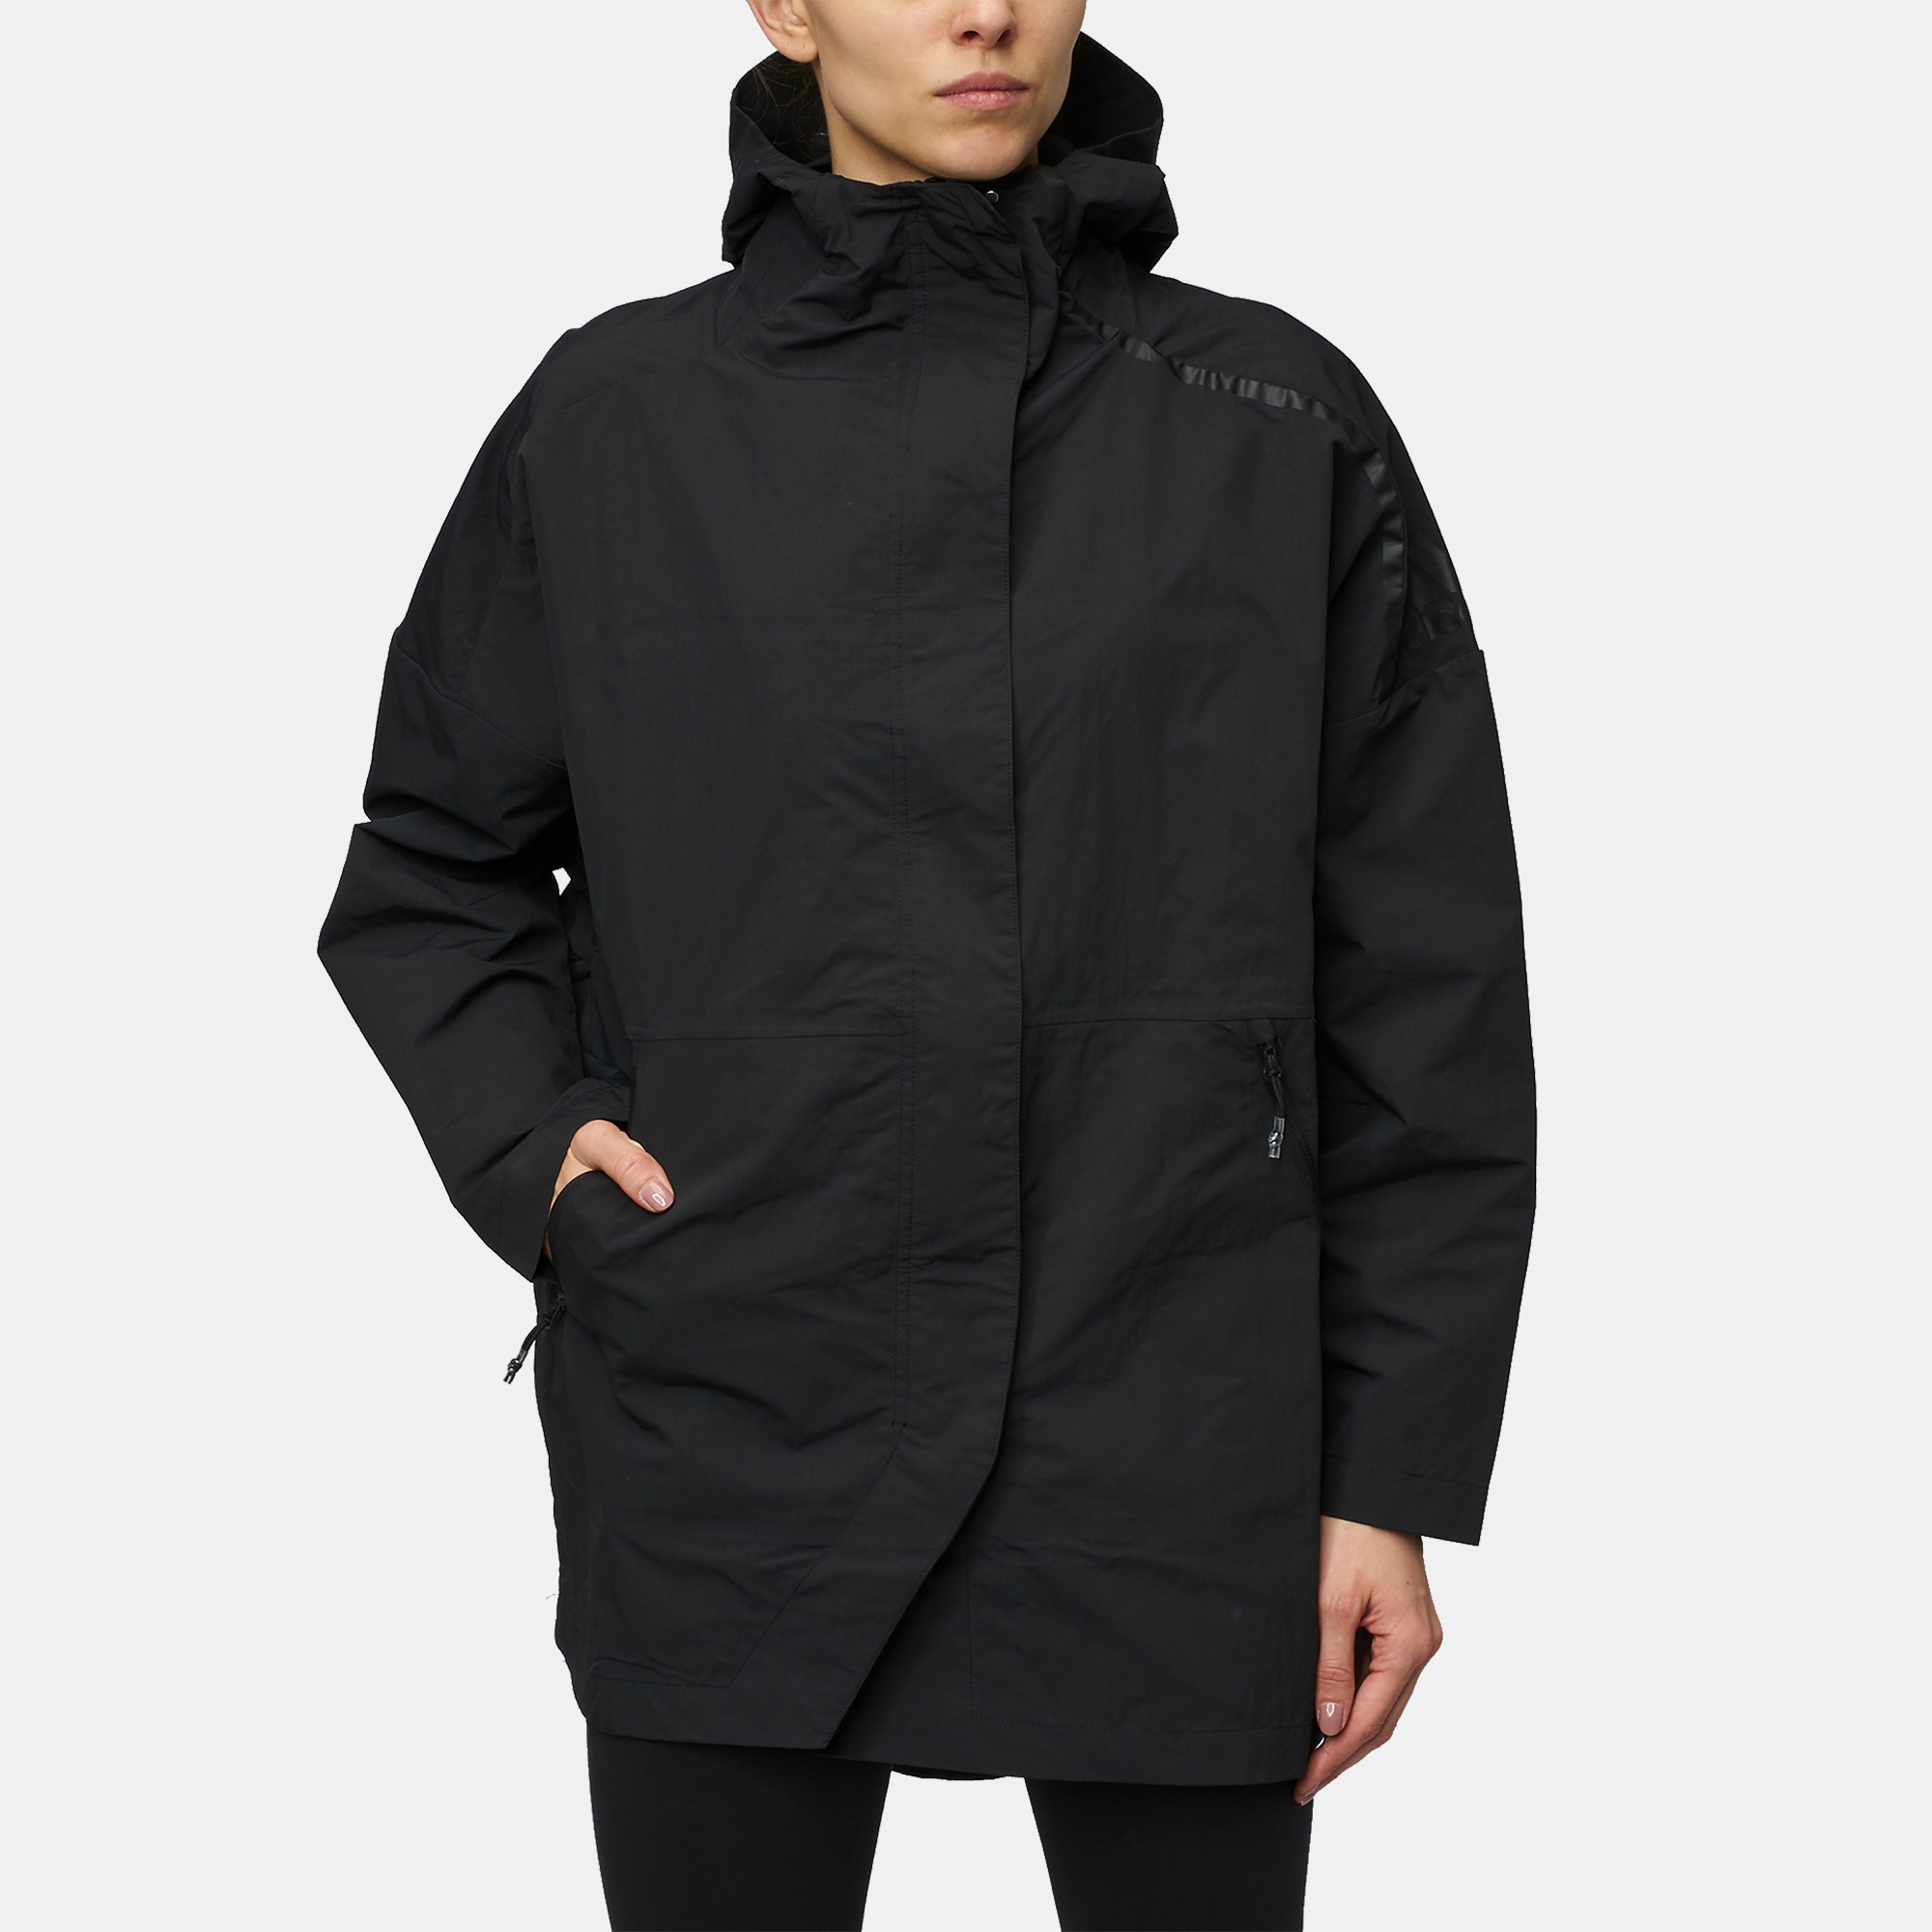 adidas Z.N.E Supershell Jacket | Hooded Jackets | Jackets